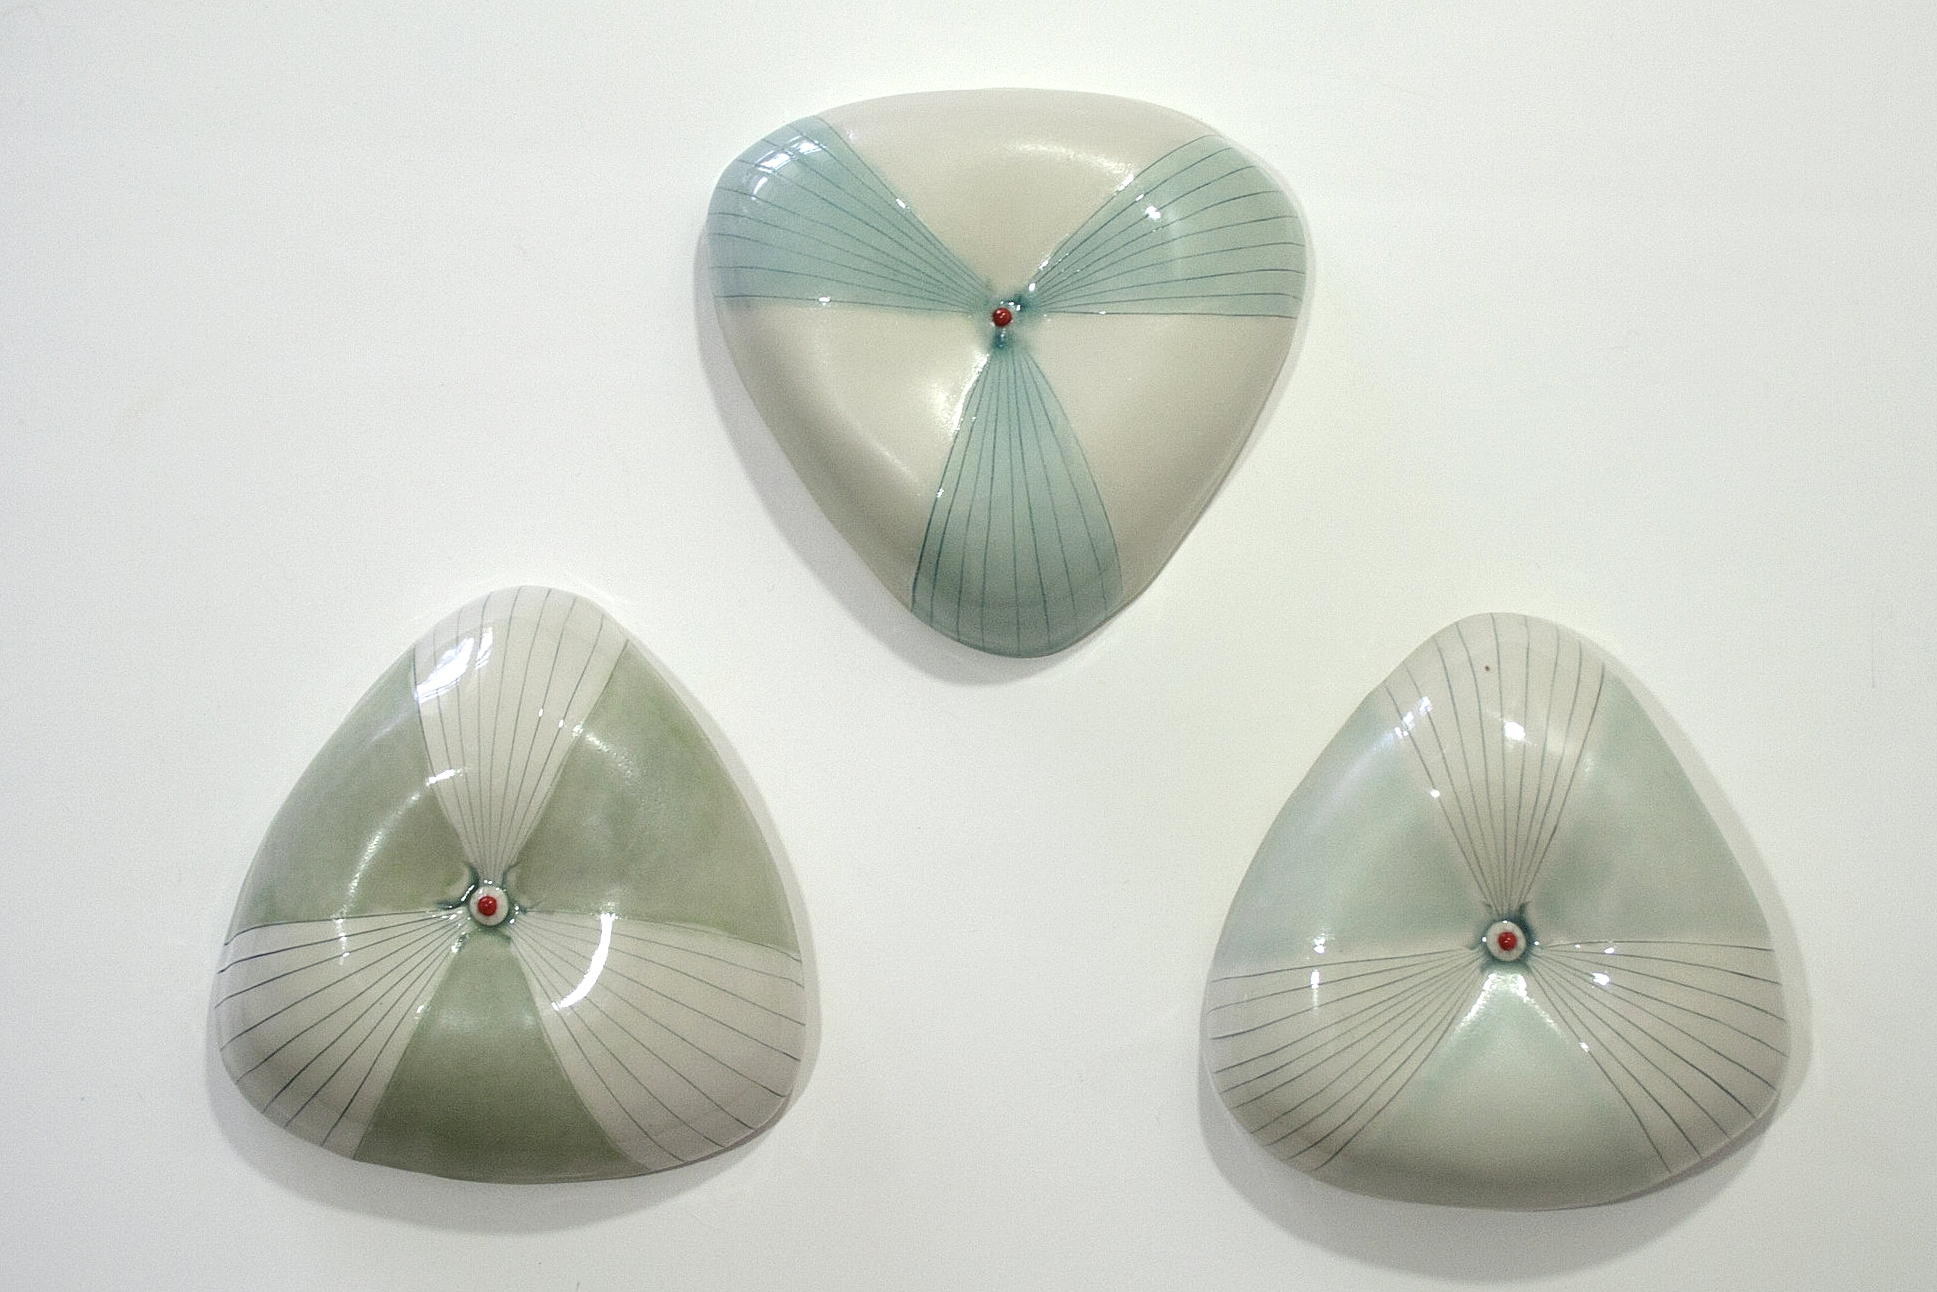 Triangle Trio Wall Pillows - Porcelain, Cone 6 Oxidation, 2016